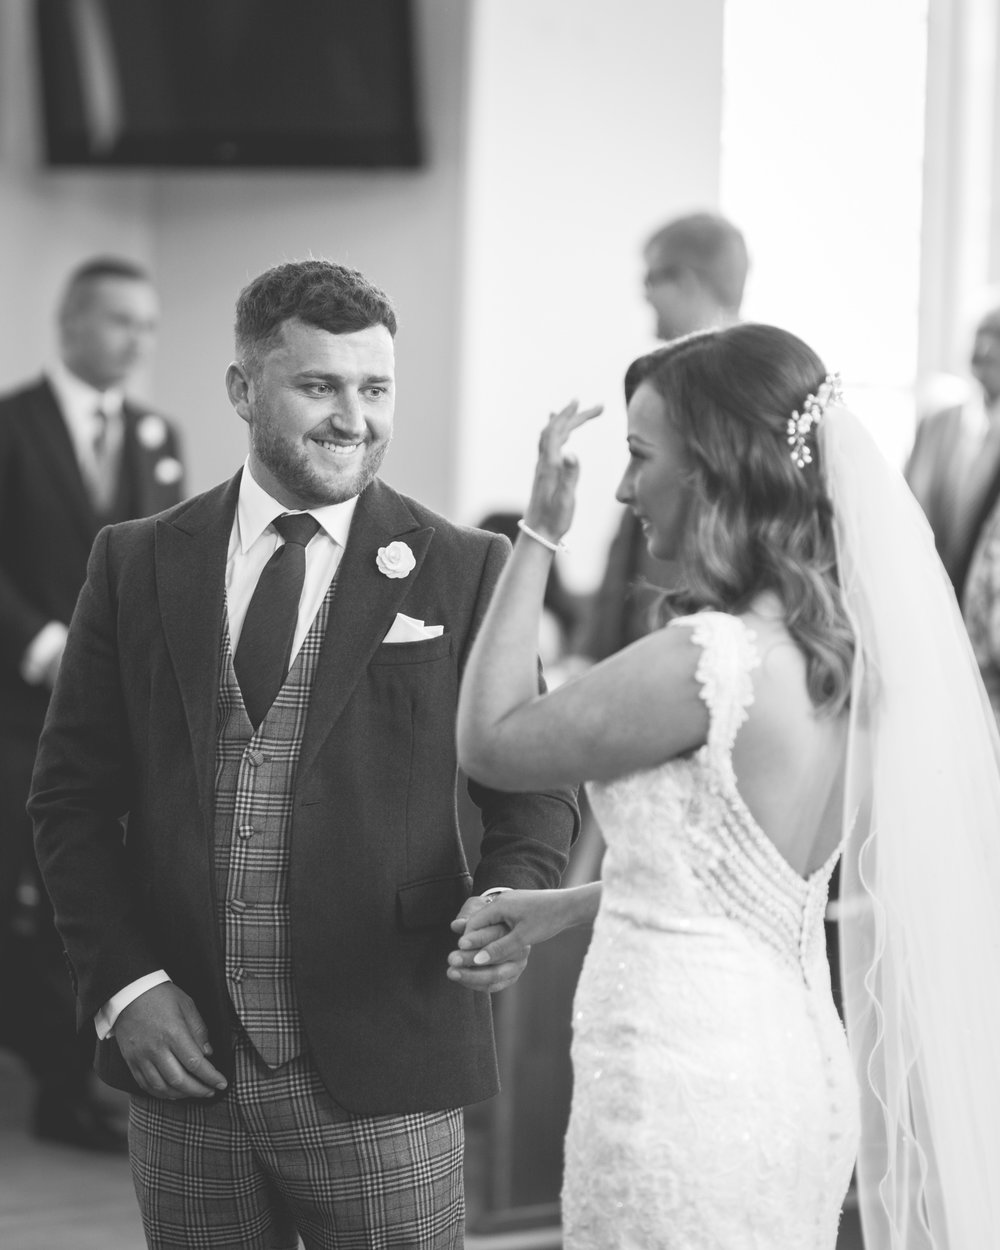 Brian McEwan | Northern Ireland Wedding Photographer | Rebecca & Michael | Ceremony-33.jpg